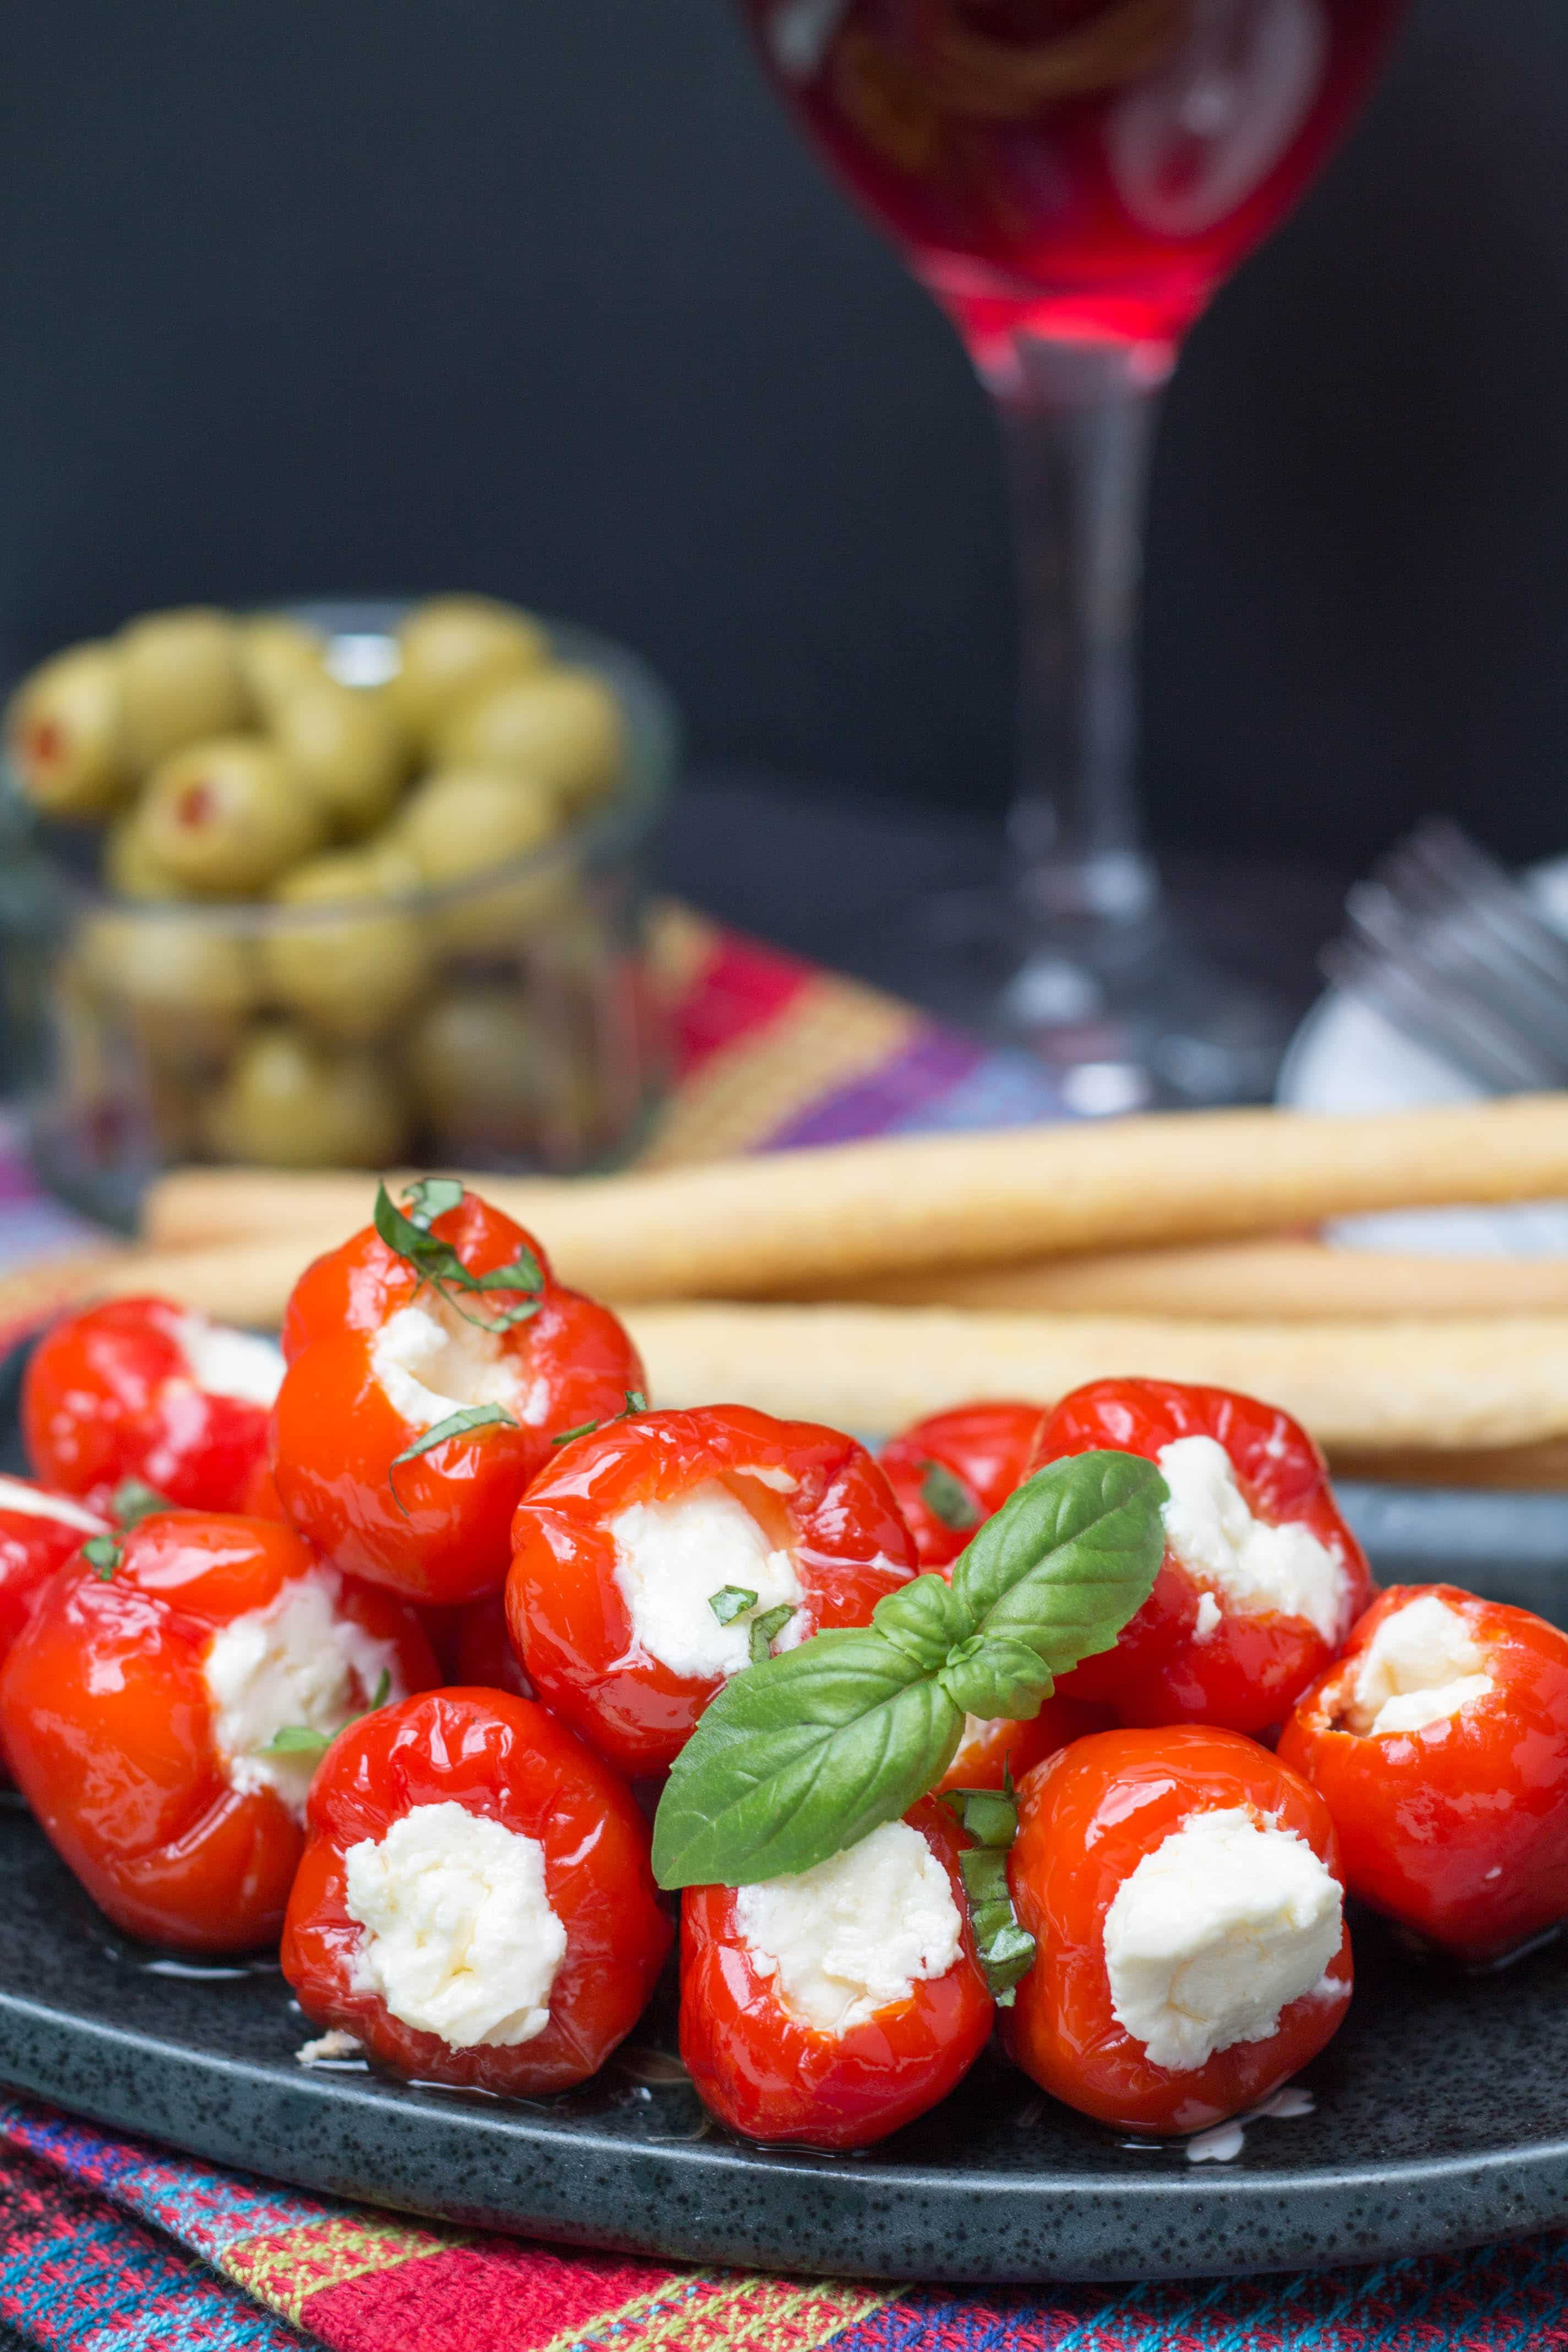 Planked Goat Cheese-Stuffed Peppadews Recipes — Dishmaps